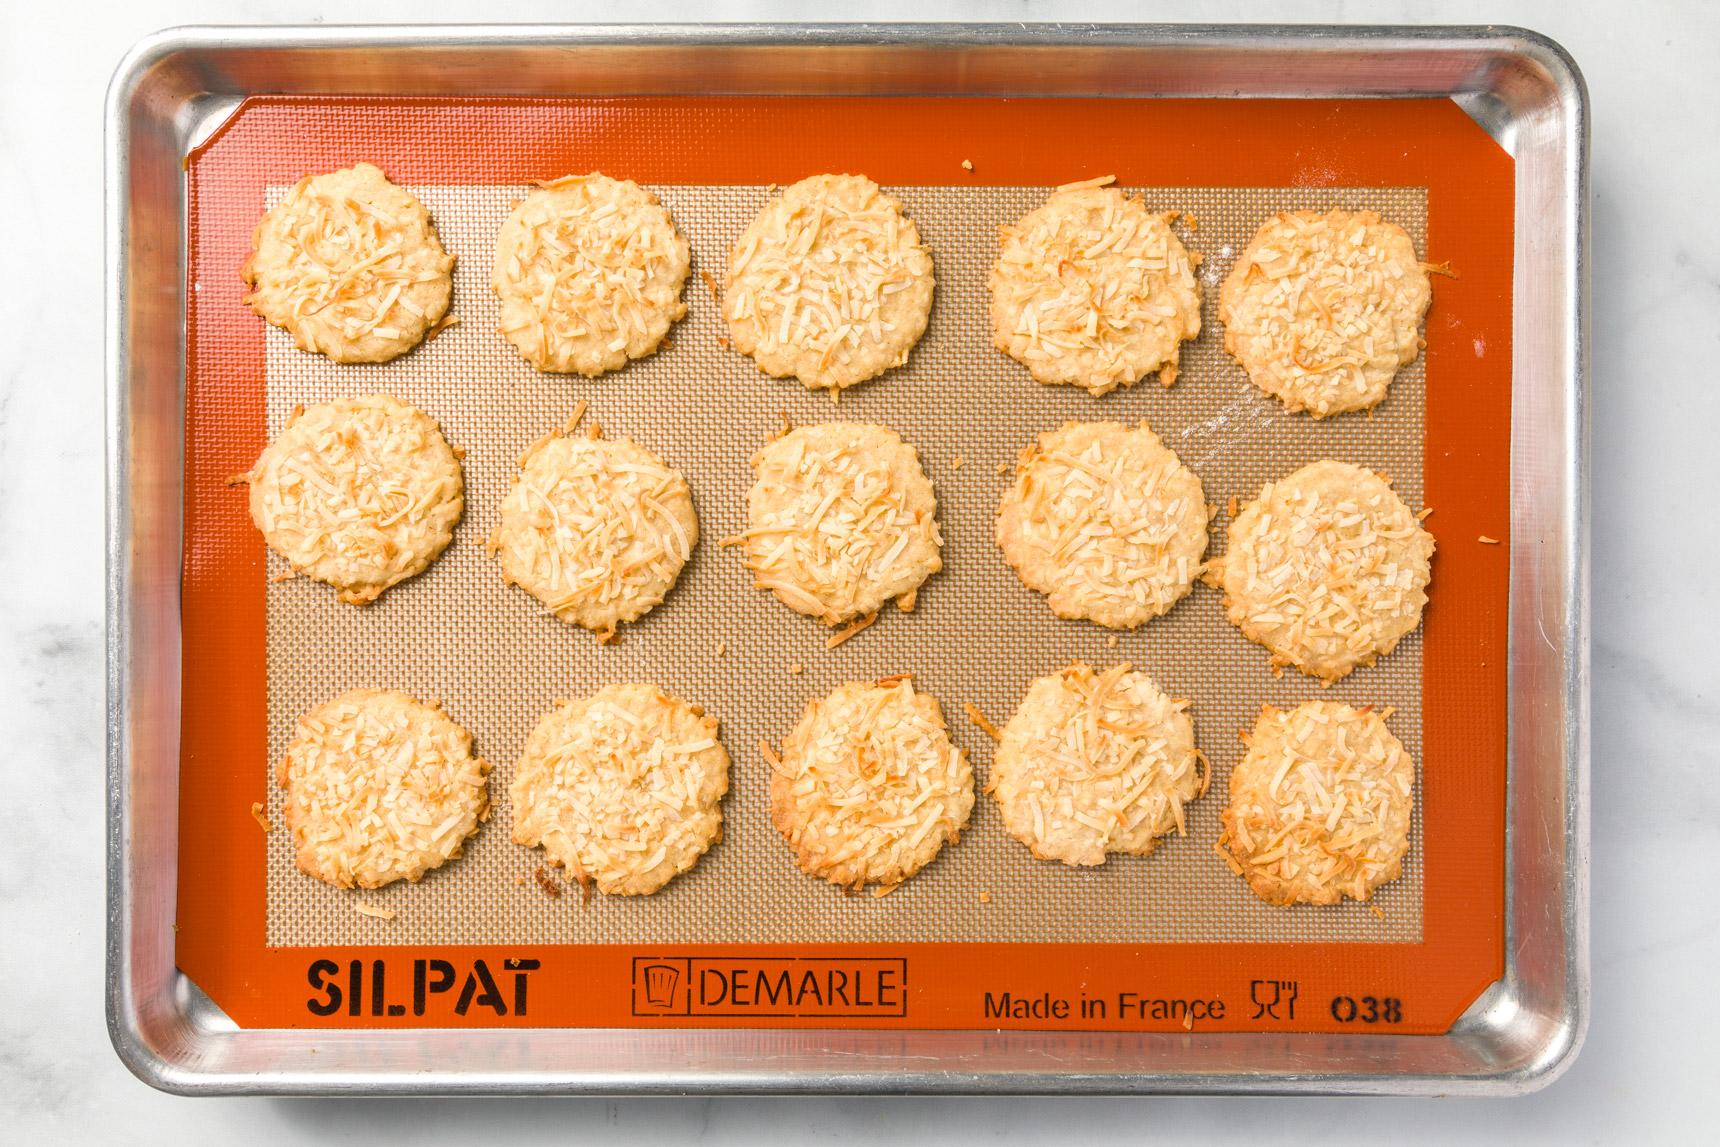 Shredded coconut cookies baked